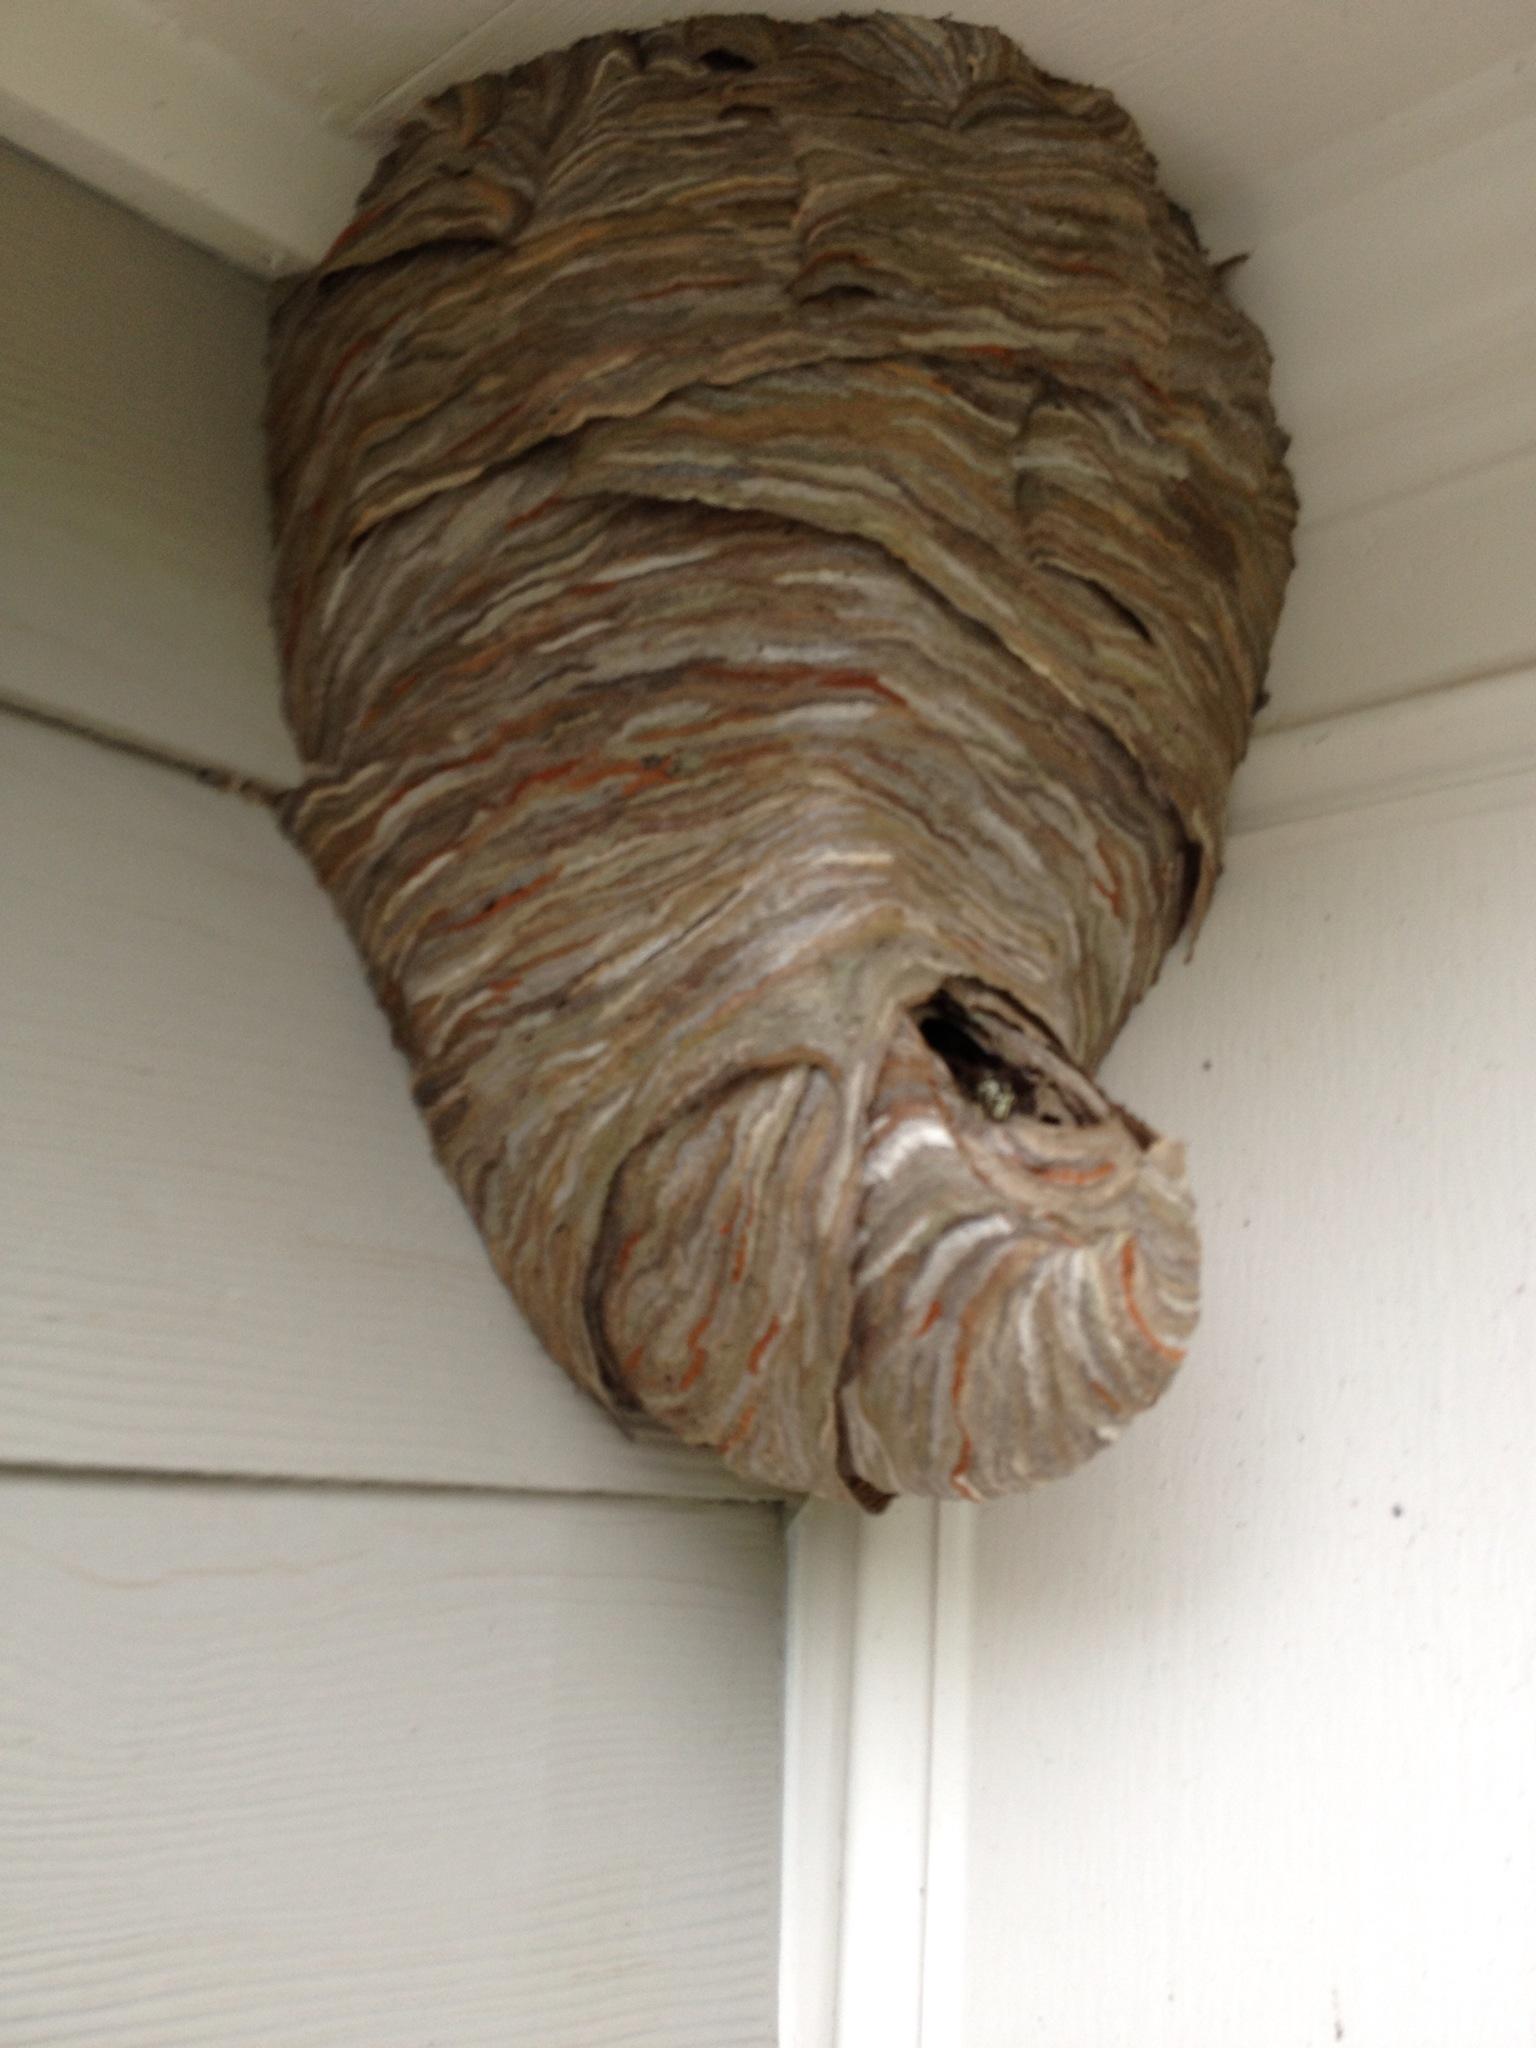 North Metro Atlanta Hornet | Bee | Yellowjacket Hive Removal